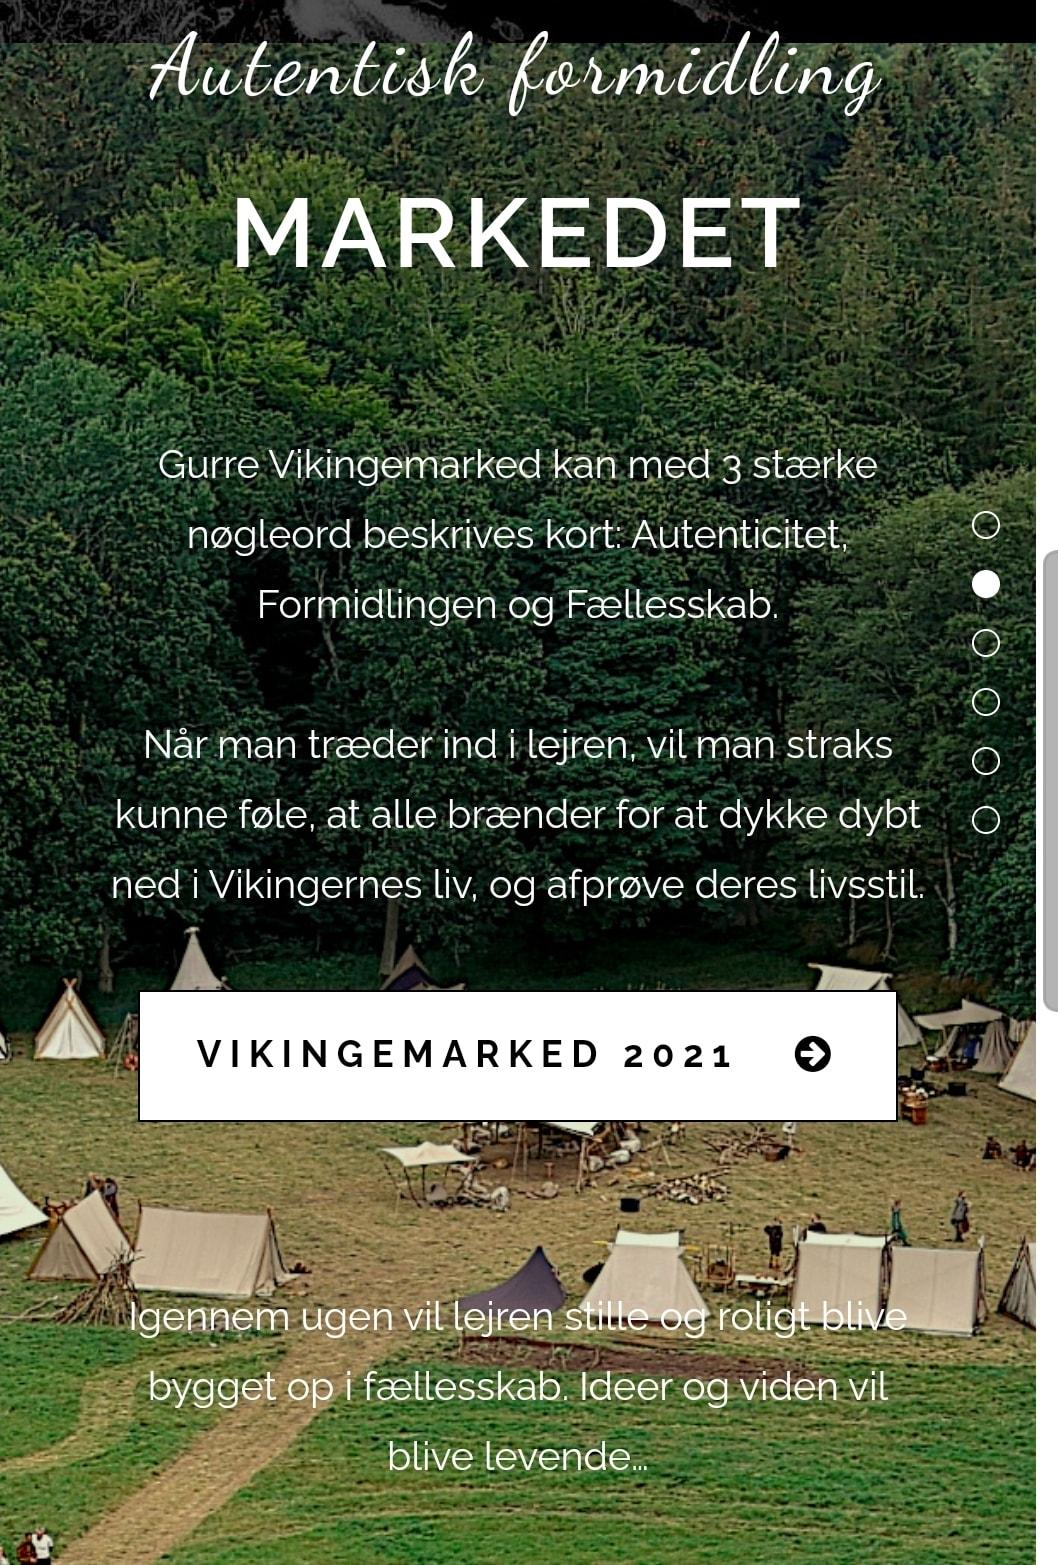 Gurre Vikingemarked